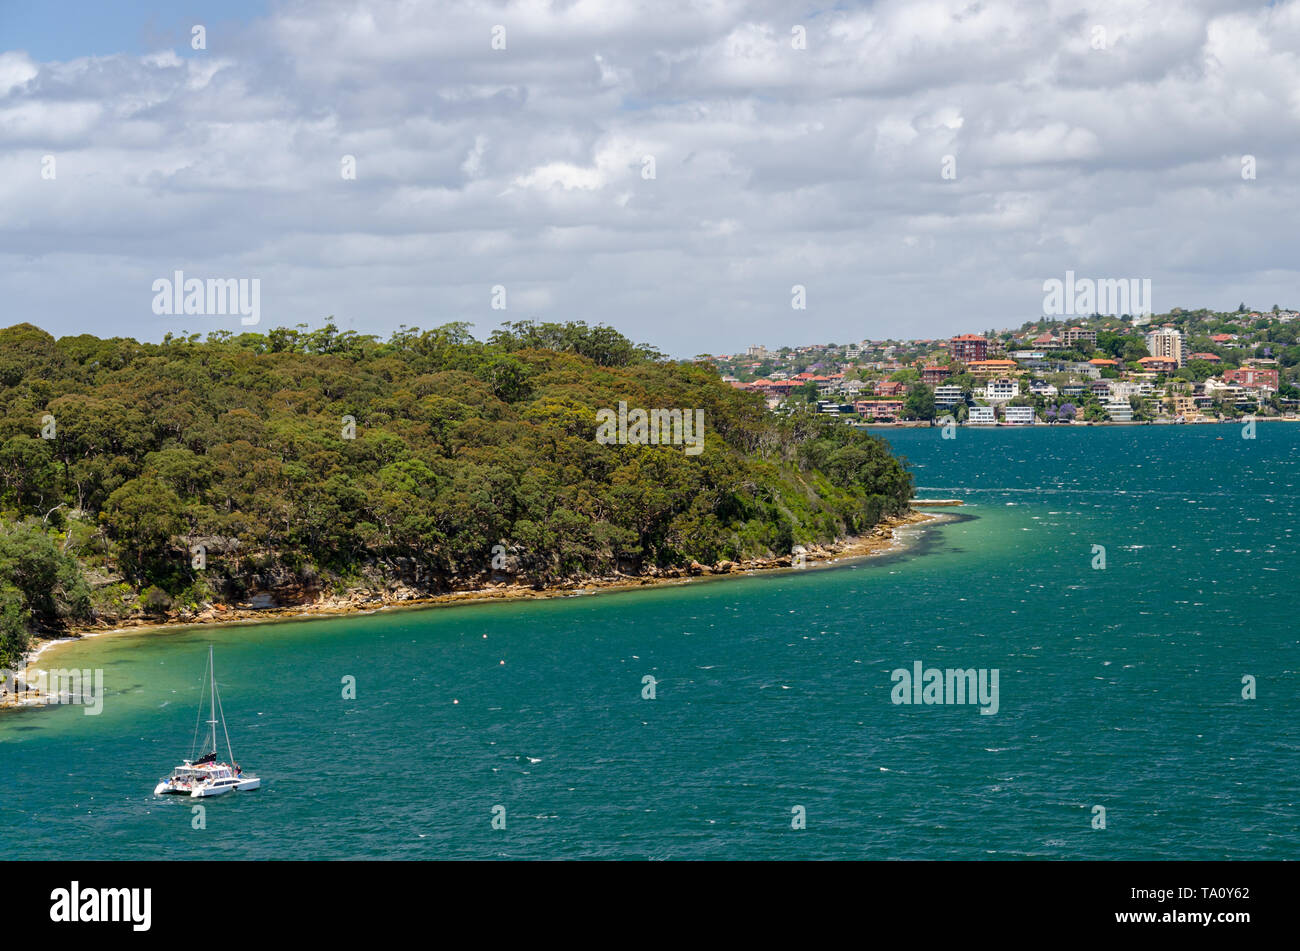 beautiful taylors bay area with a boat , catamaran - Stock Image